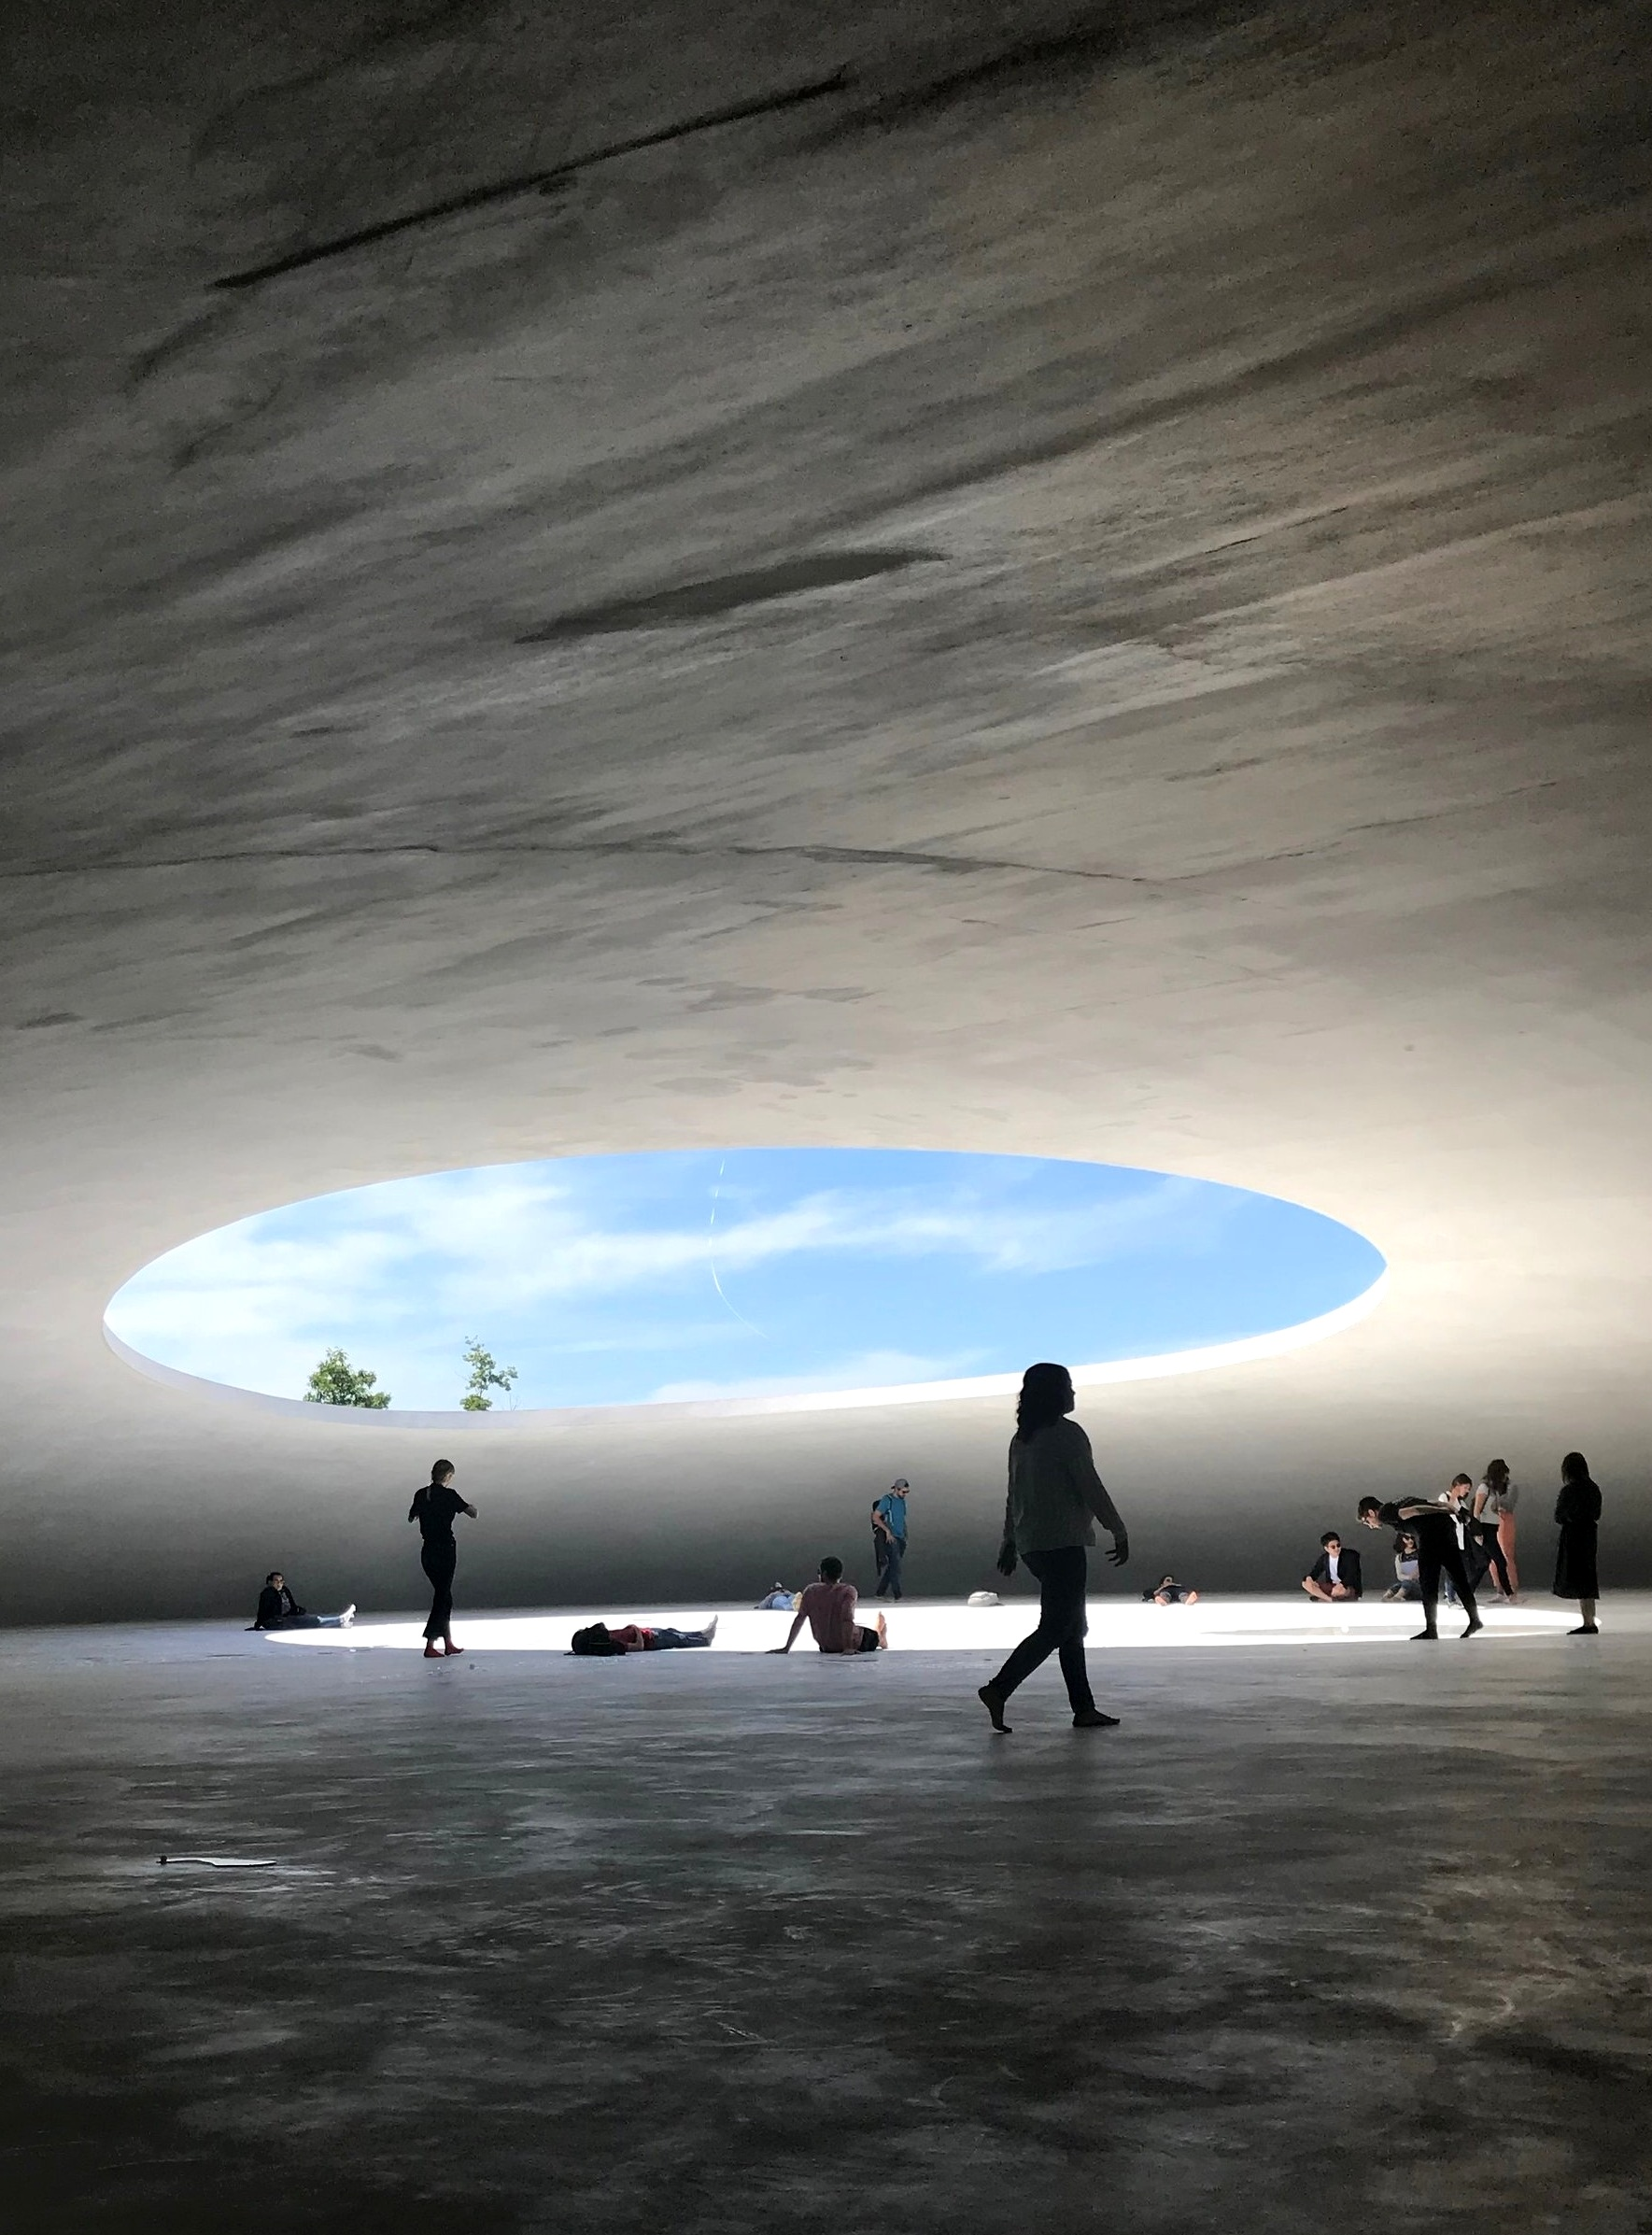 INSIDE TESHIMA ART MUSEUm